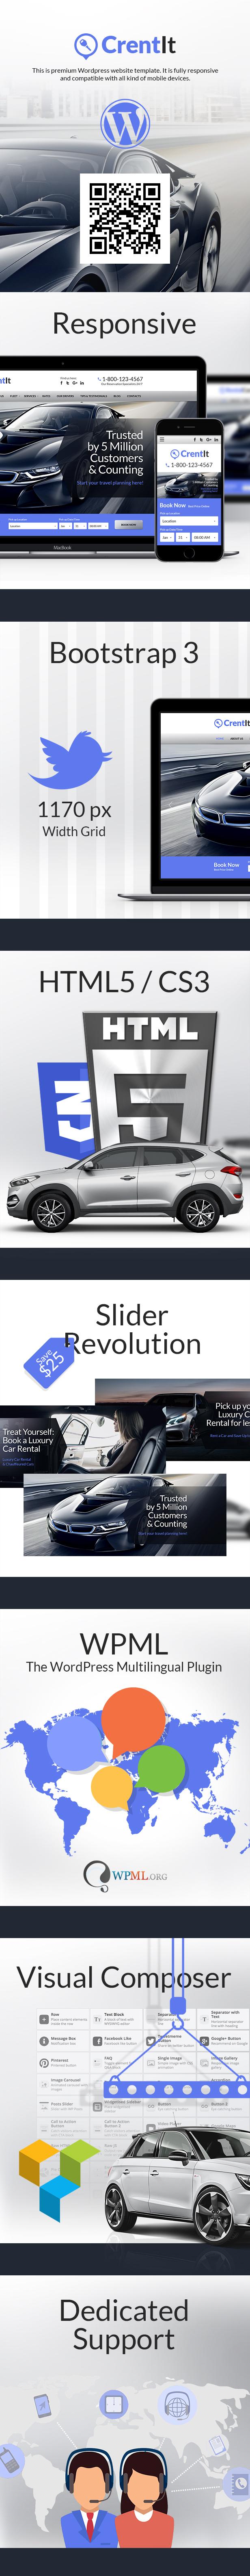 Rental Cars - Car Rental WordPress website theme